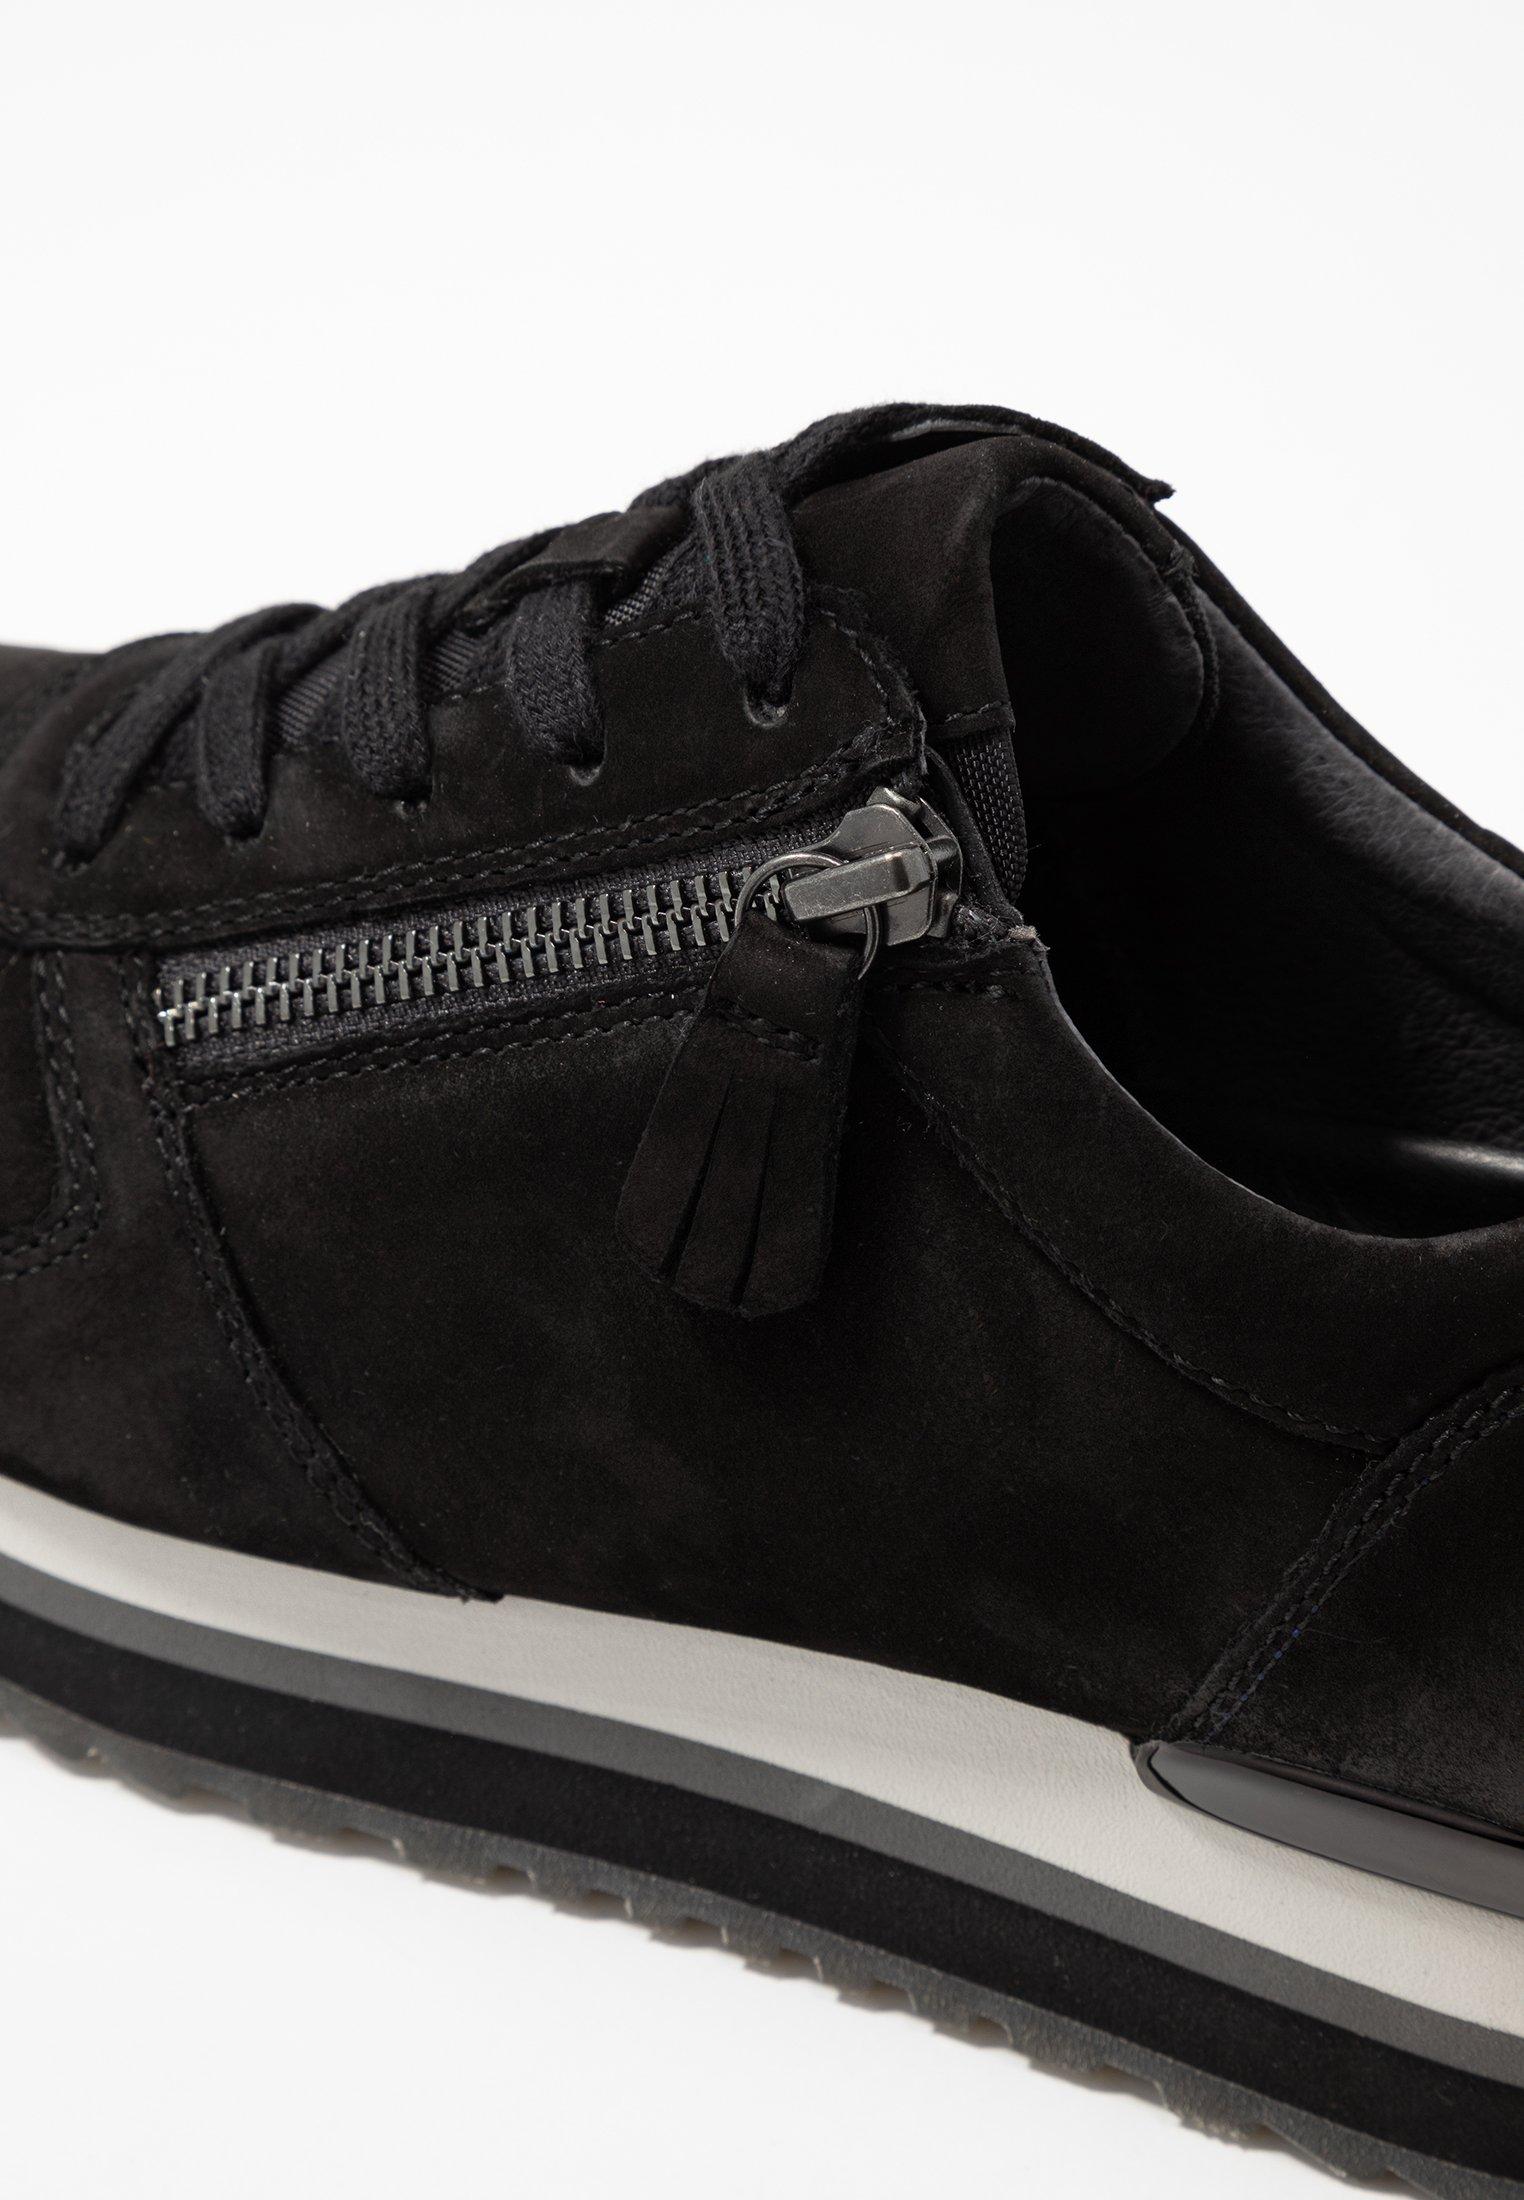 Schwarz FitSneakers Wide Schwarz FitSneakers Wide Wide Gabor Gabor Gabor Basse Basse kw08nOP